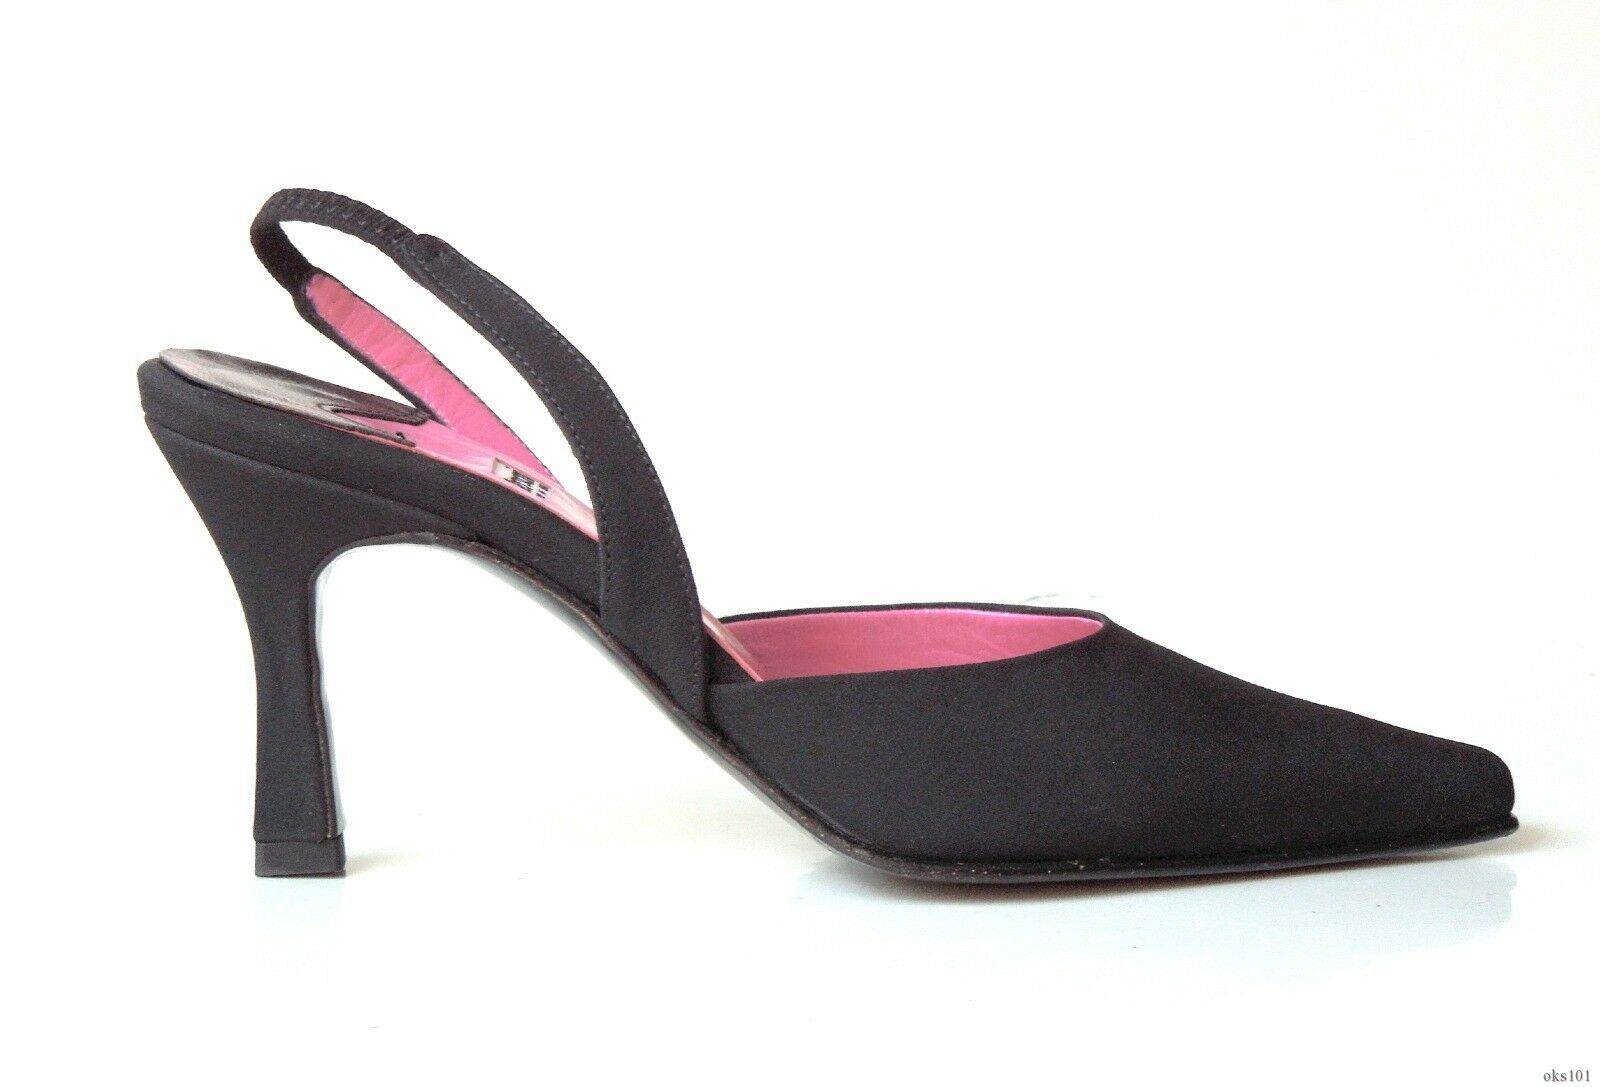 Nuevo Versani 8523 Negro Crepé Crepé Crepé Slingback zapatos de salón Italia-Elegante 6cb696